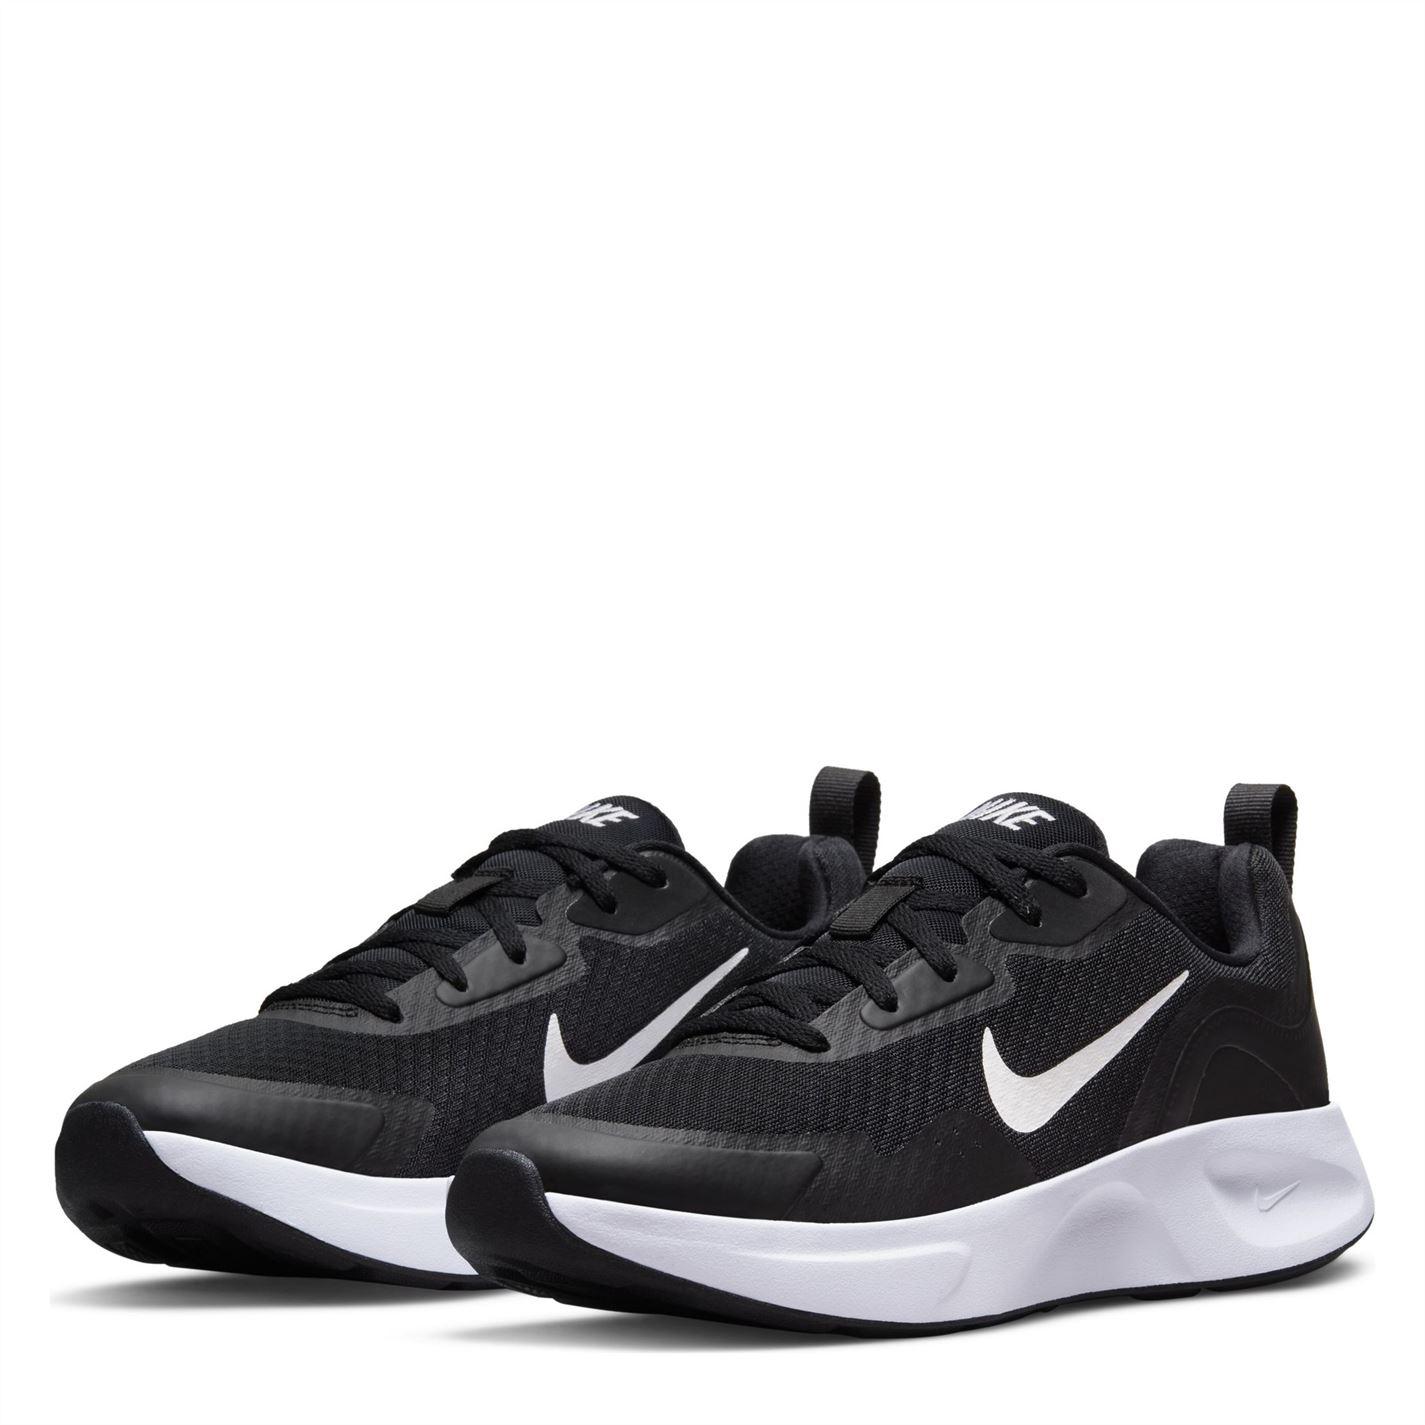 Adidasi sport Nike Wearallday pentru femei negru alb